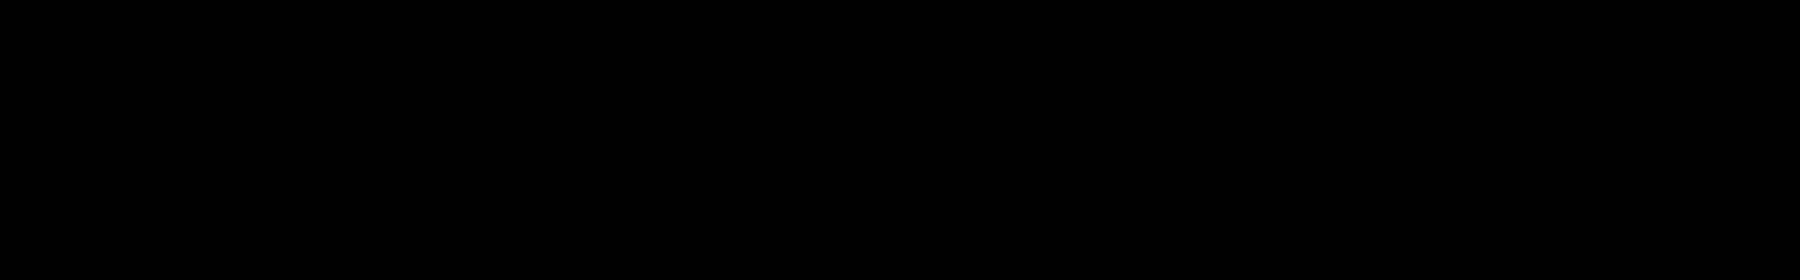 F.S.H.R 2 audio waveform